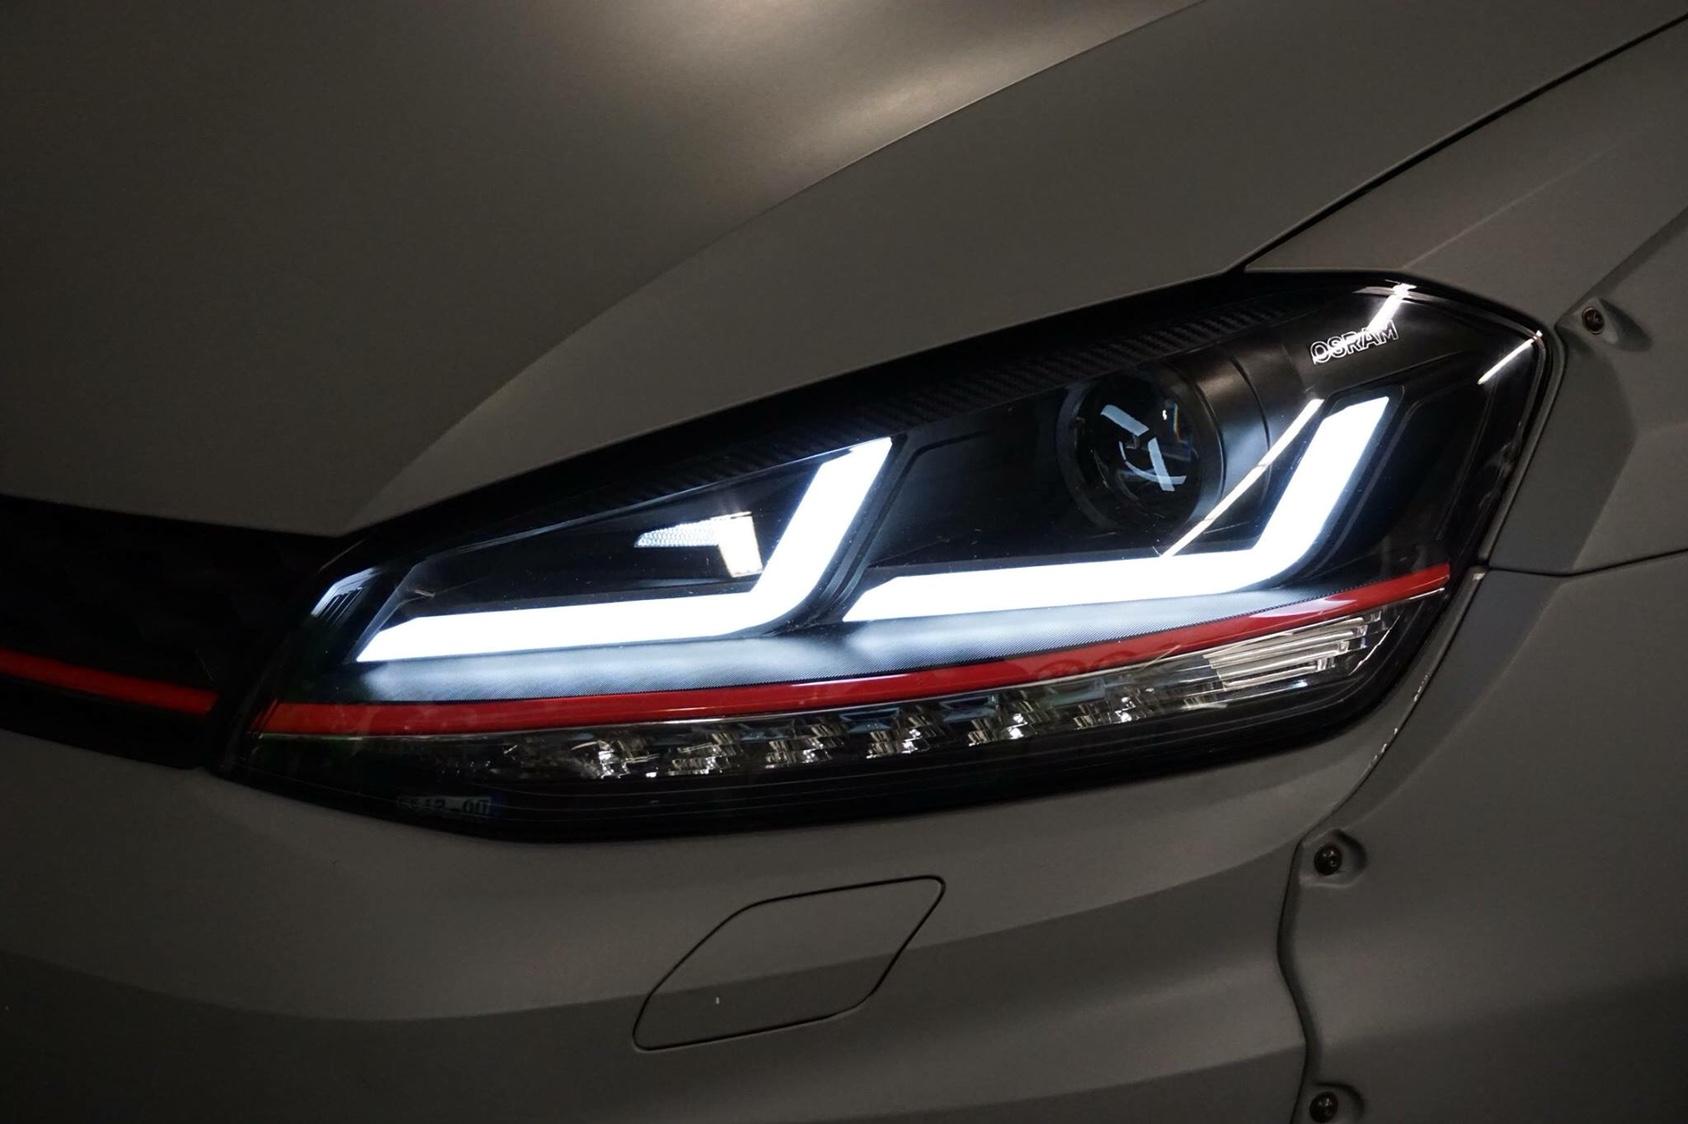 Nissan Of Omaha >> VWVortex.com - Osram Xenarc Bi-Xenon headlights